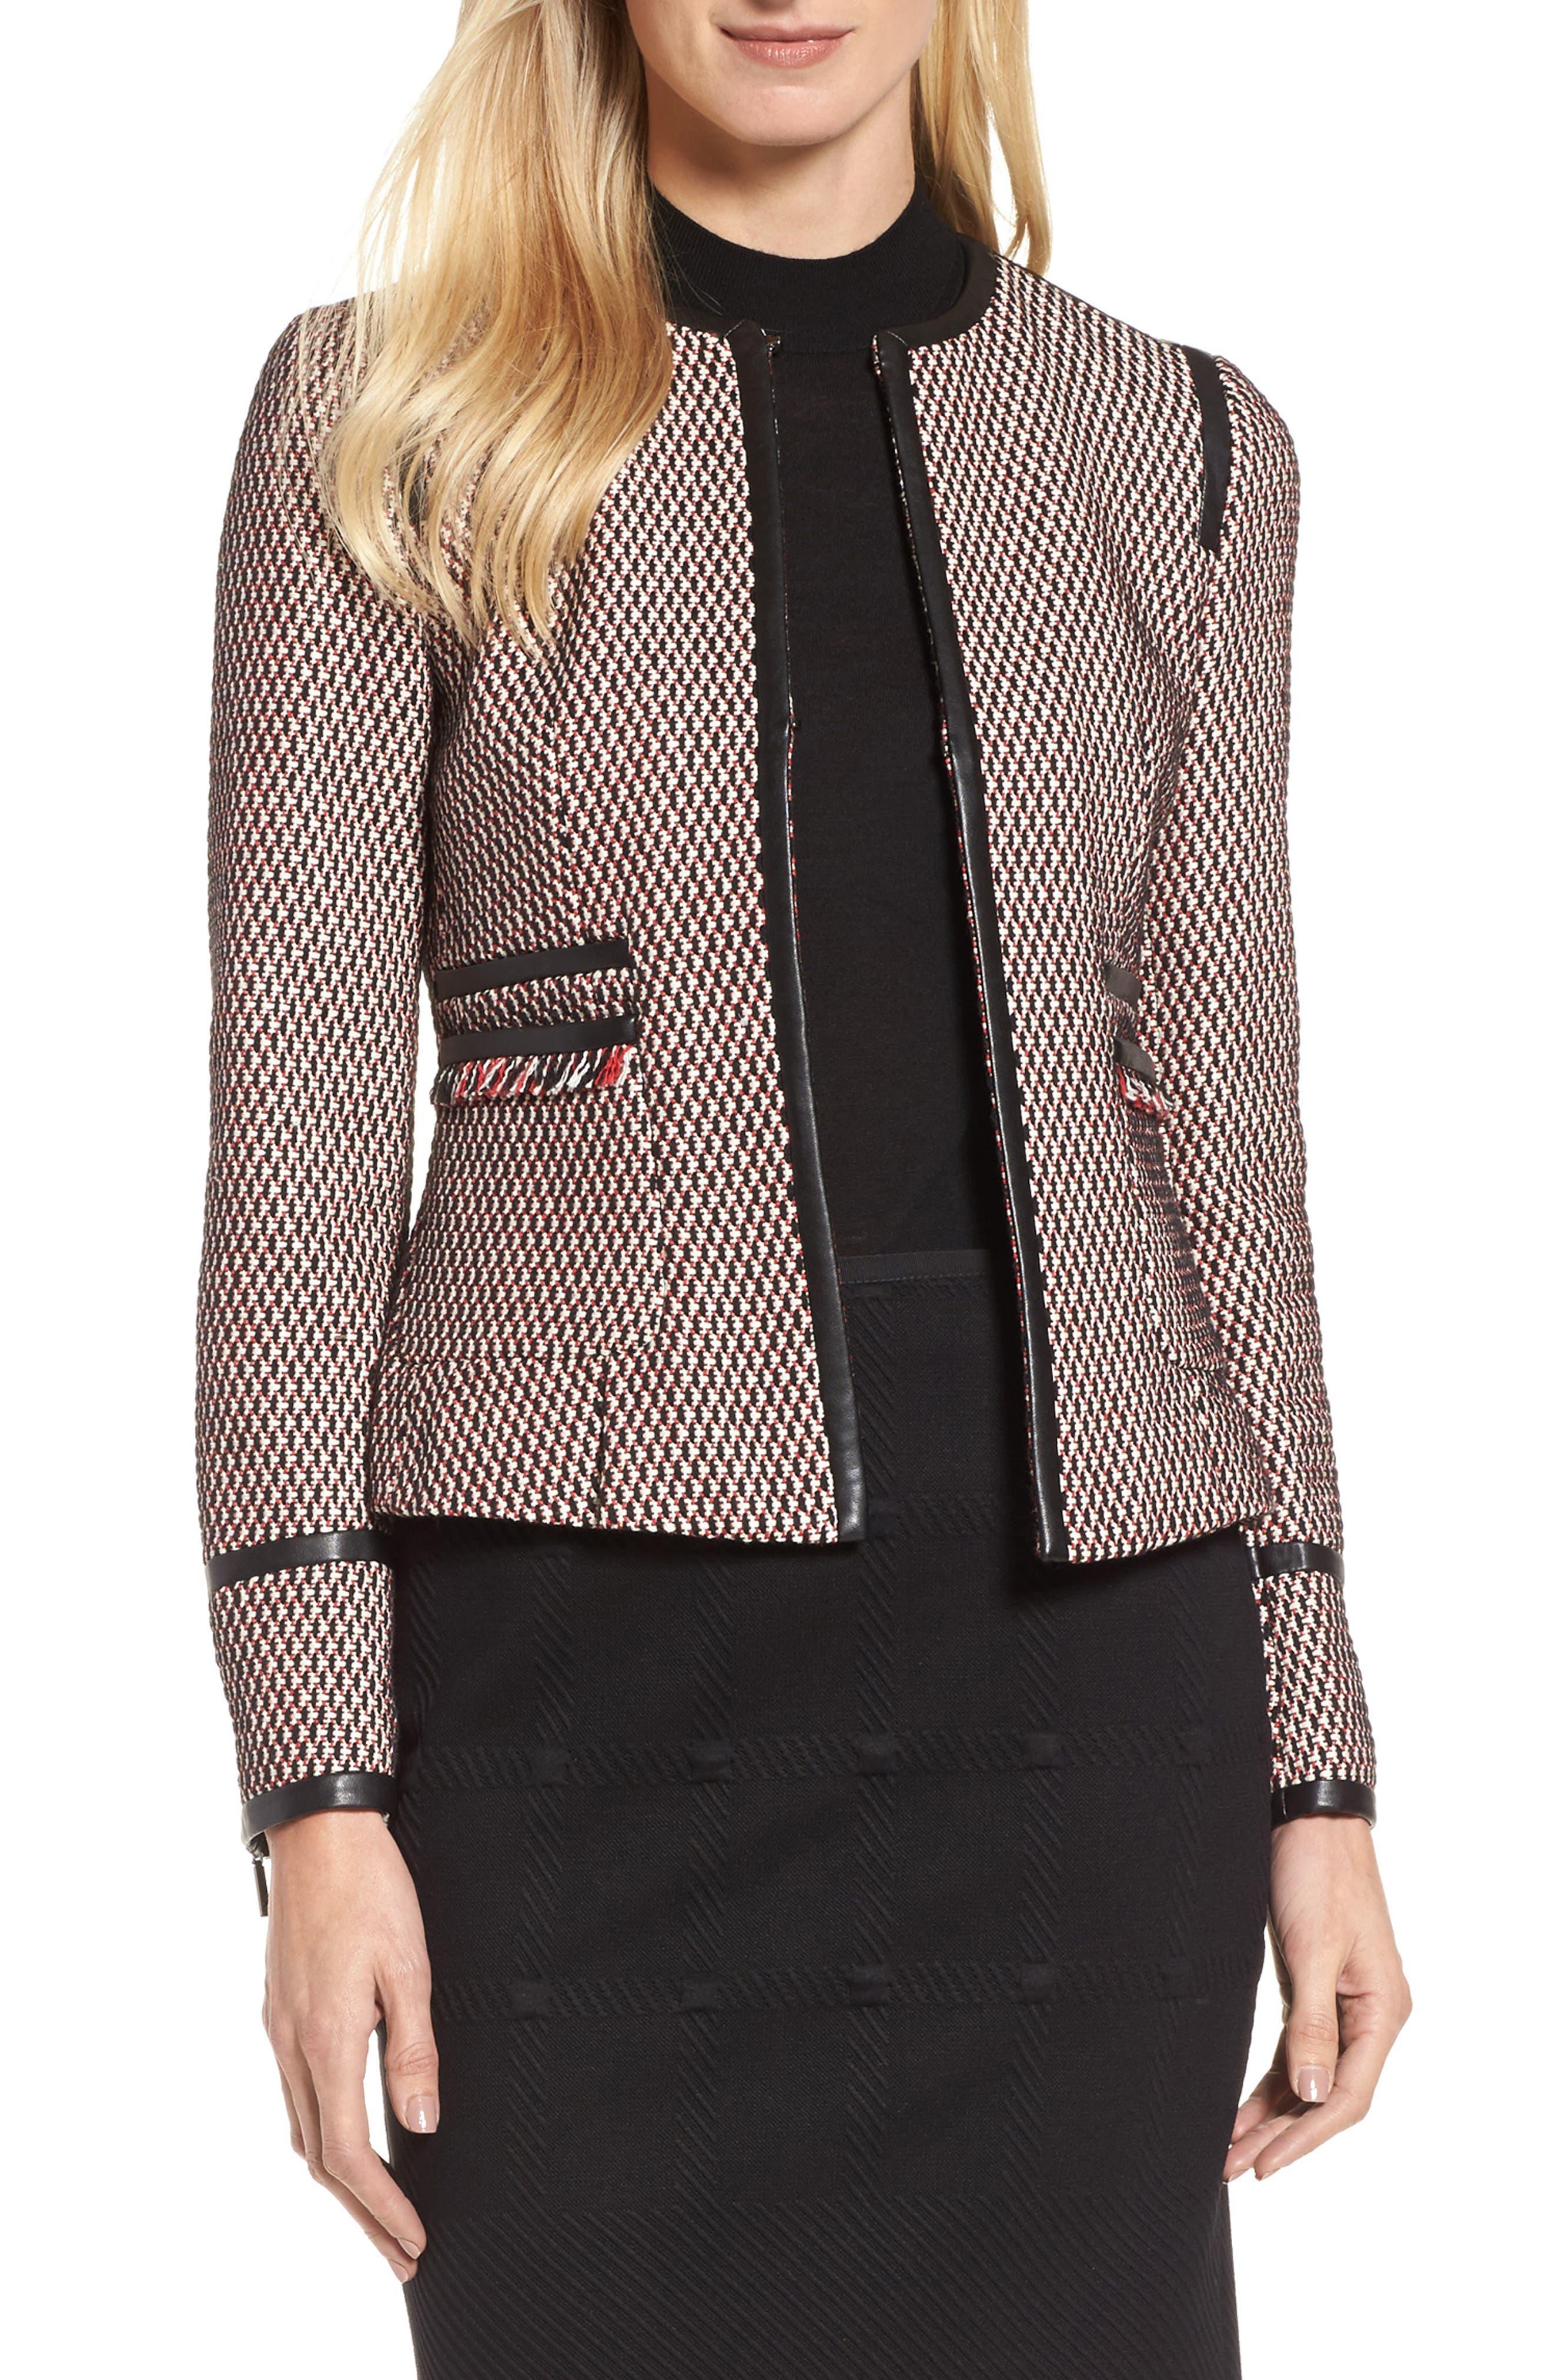 Keili Collarless Tweed Jacket,                             Main thumbnail 1, color,                             903